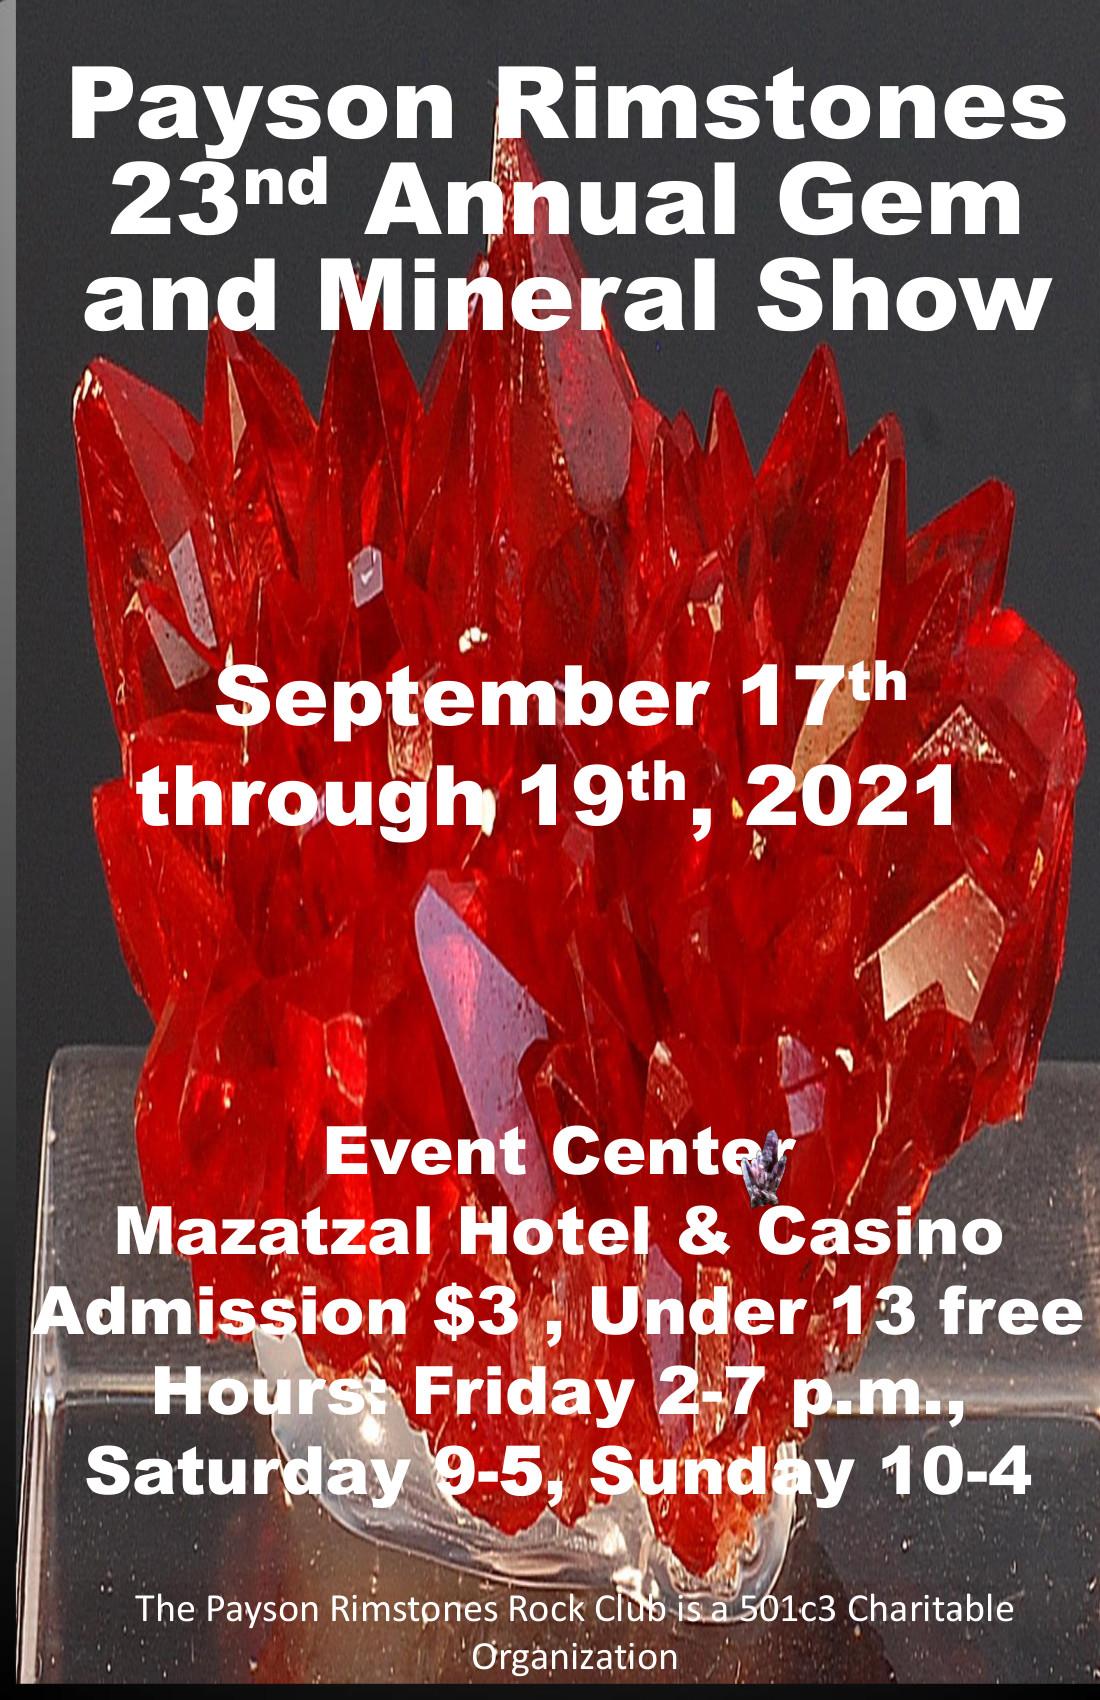 Payson Rimstones 23rd Annual Gem & Mineral Show